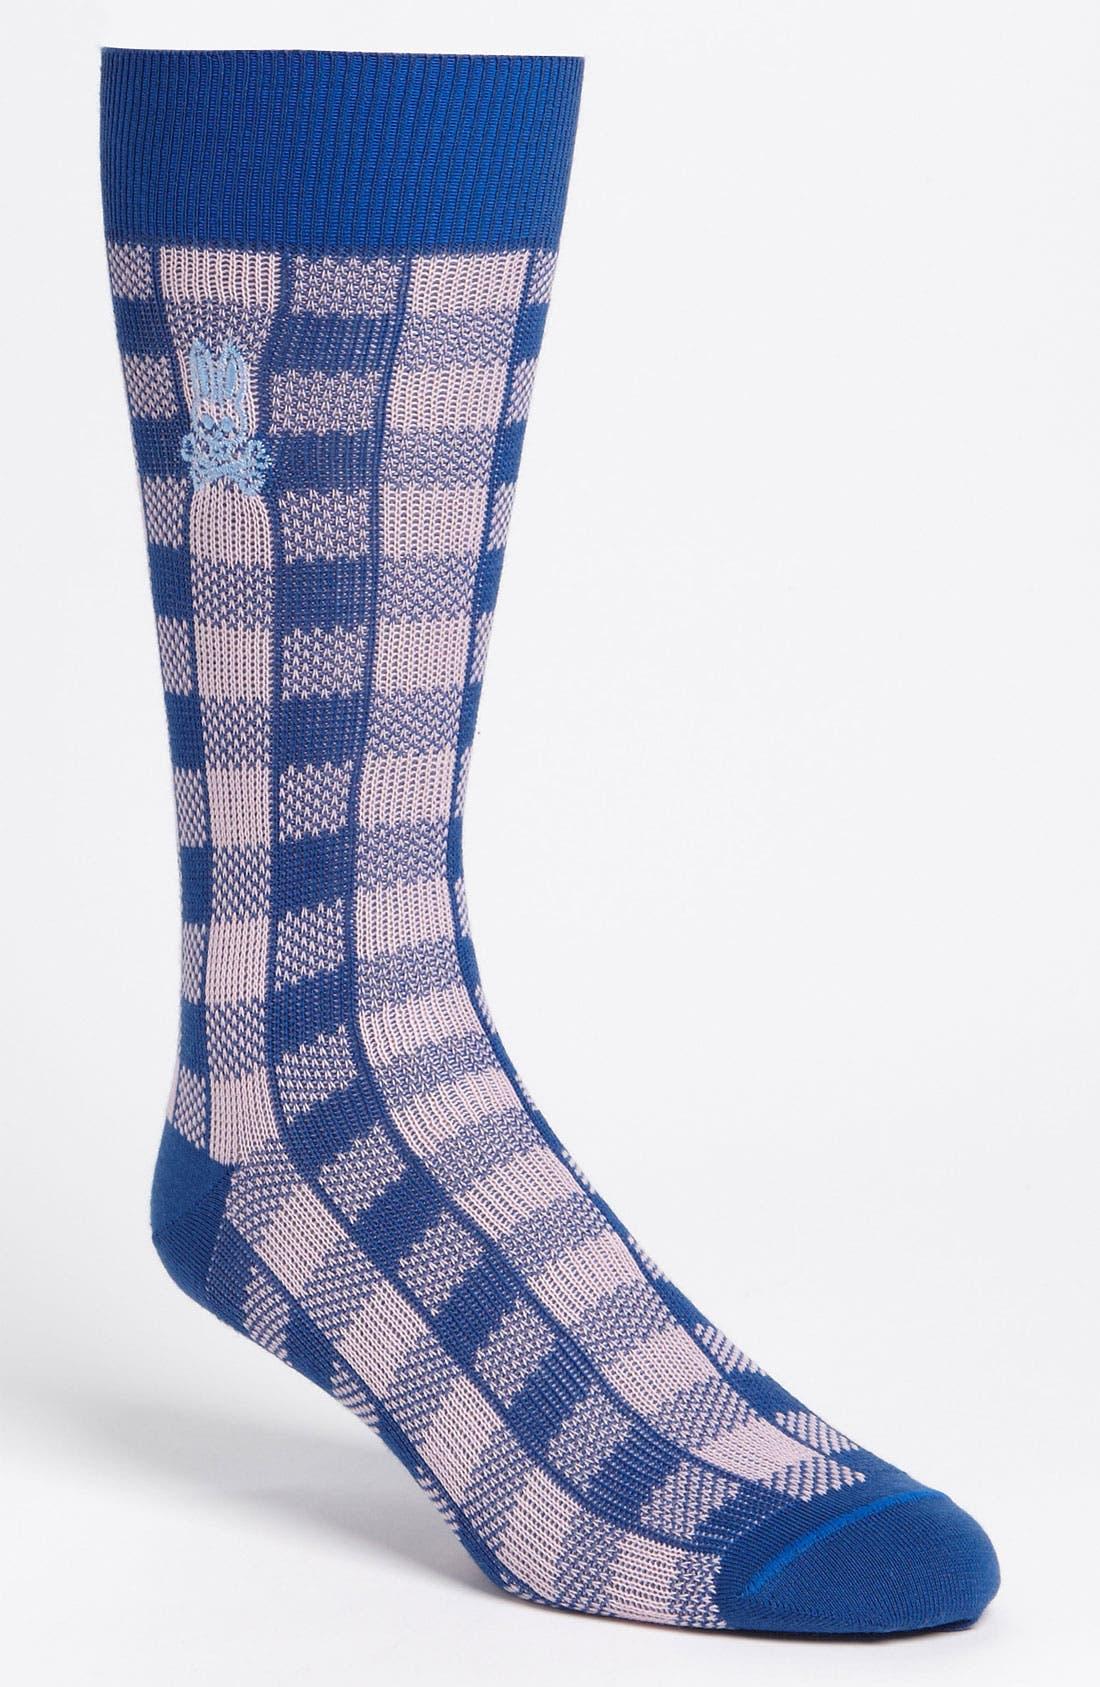 Main Image - Psycho Bunny 'Golf Check' Socks